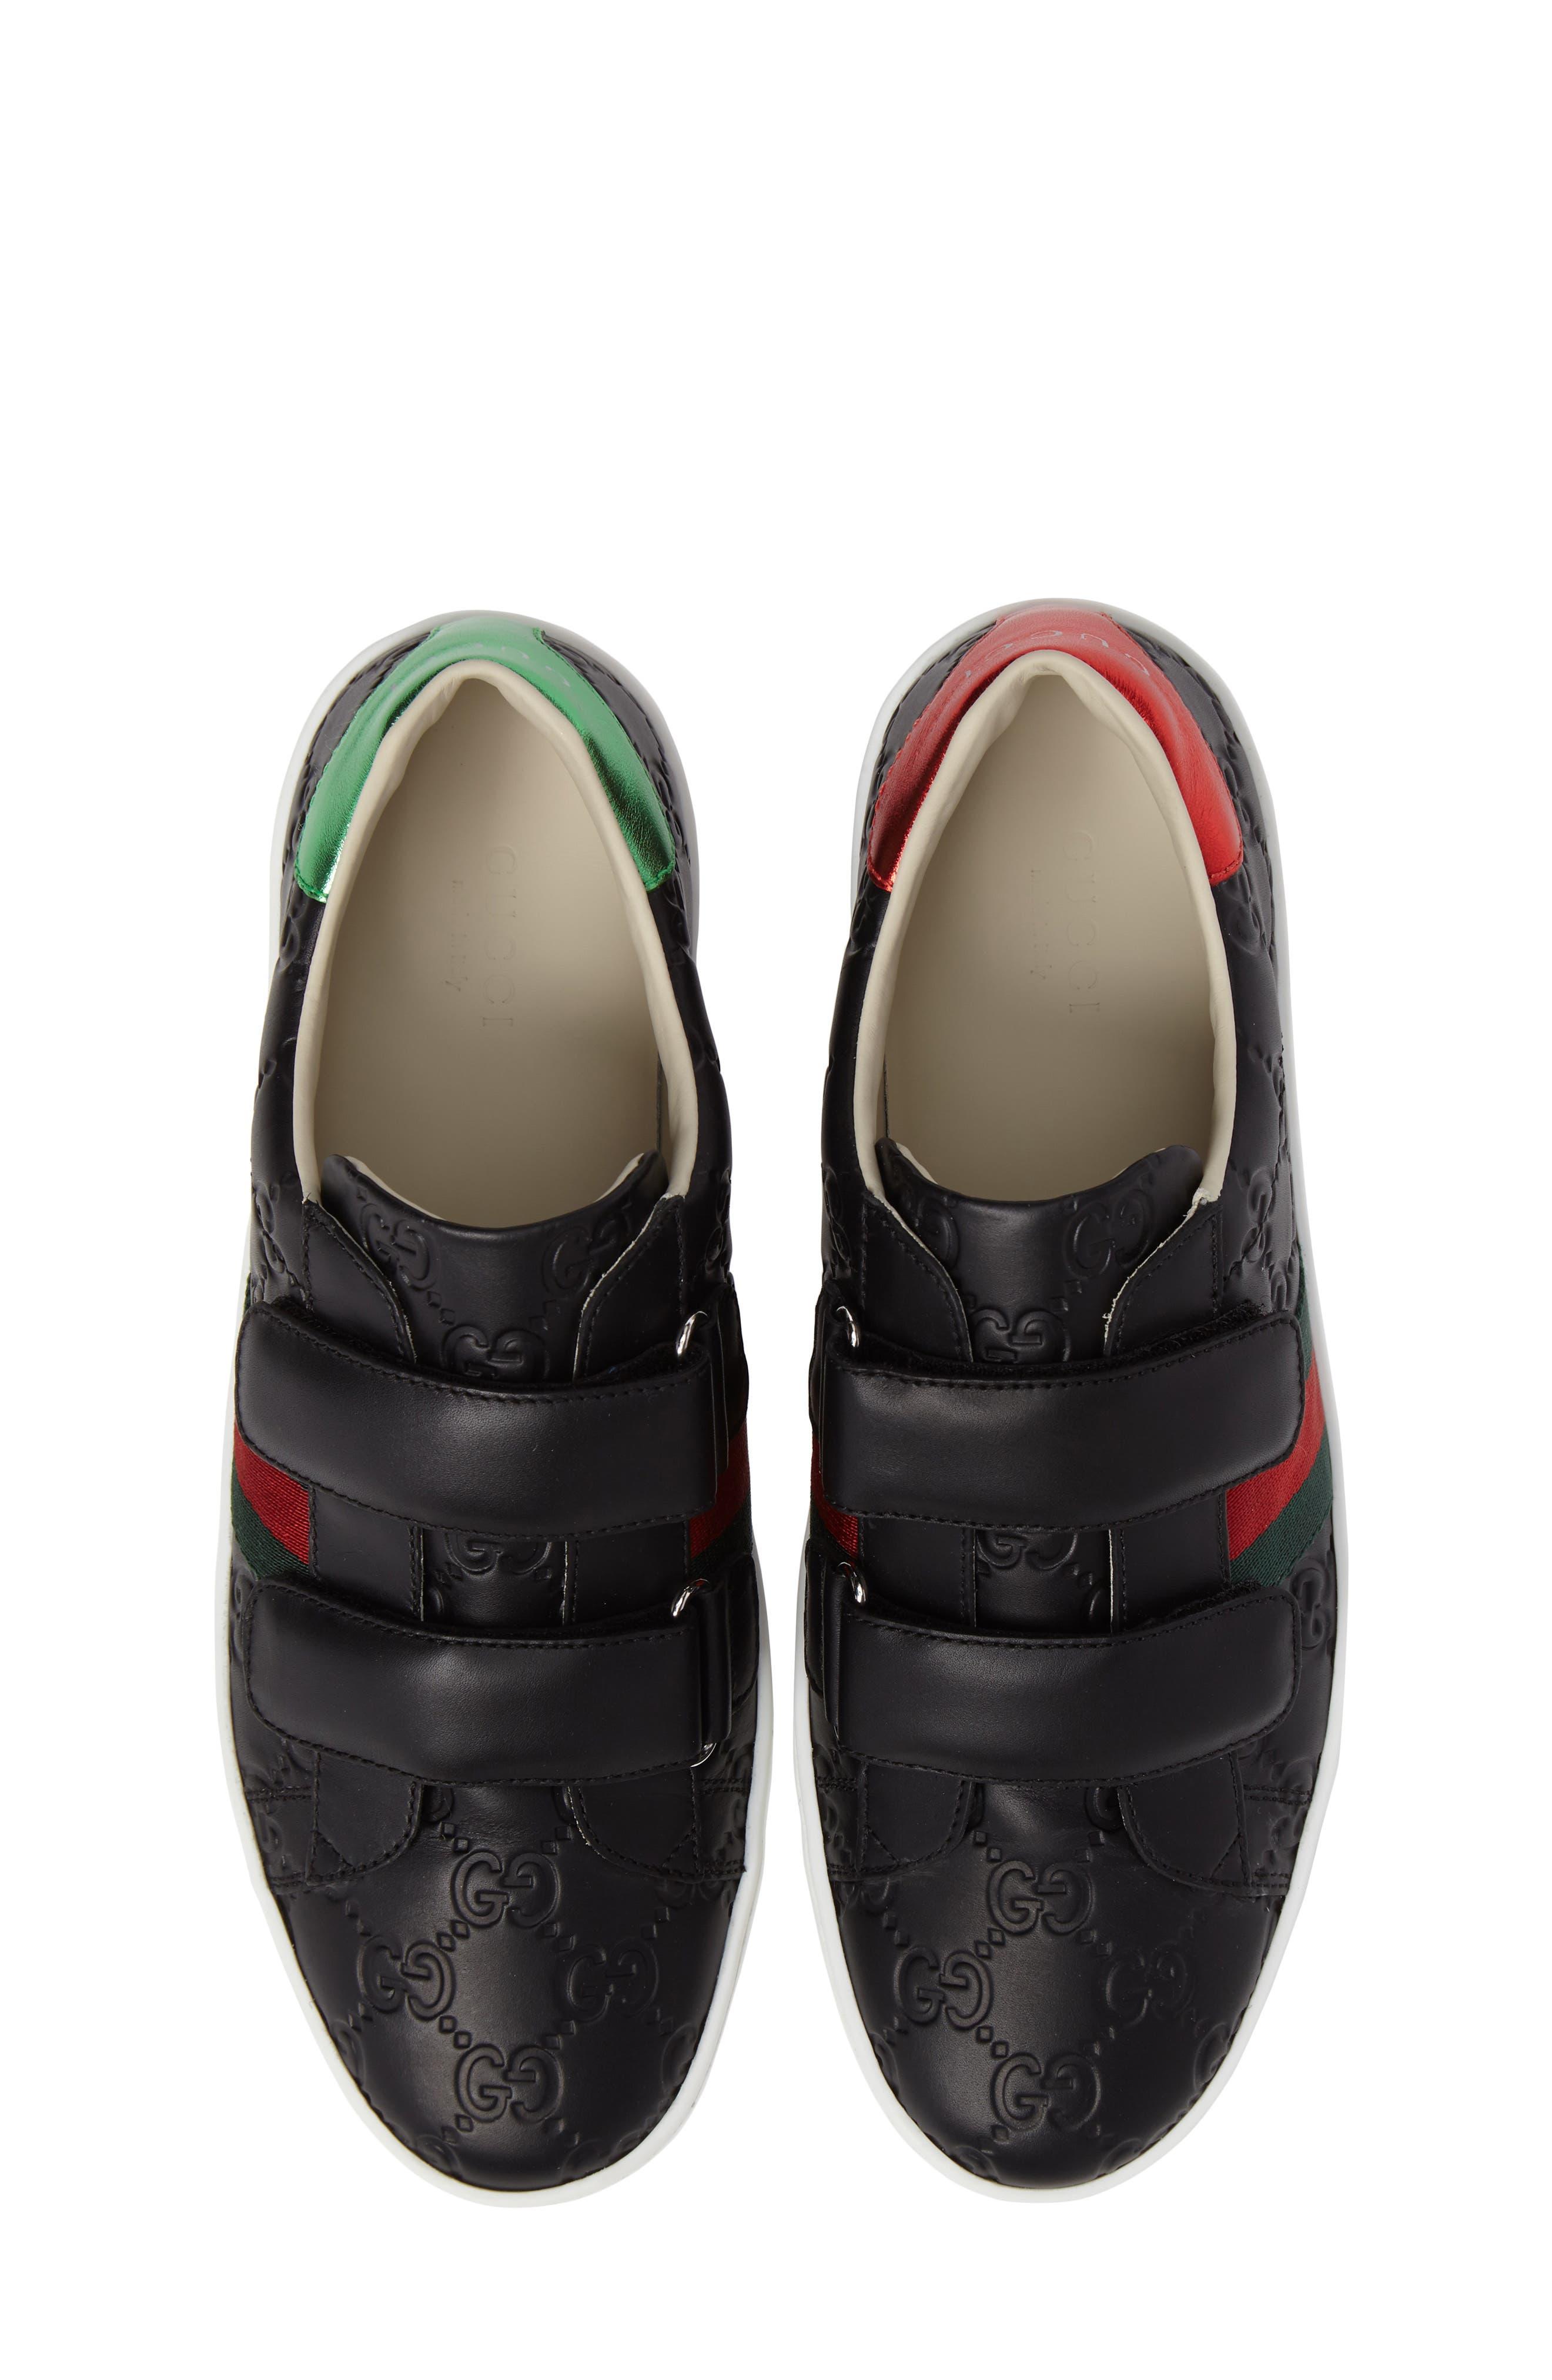 Kids Gucci New Ace Sneaker Size 5US  37EU  Black